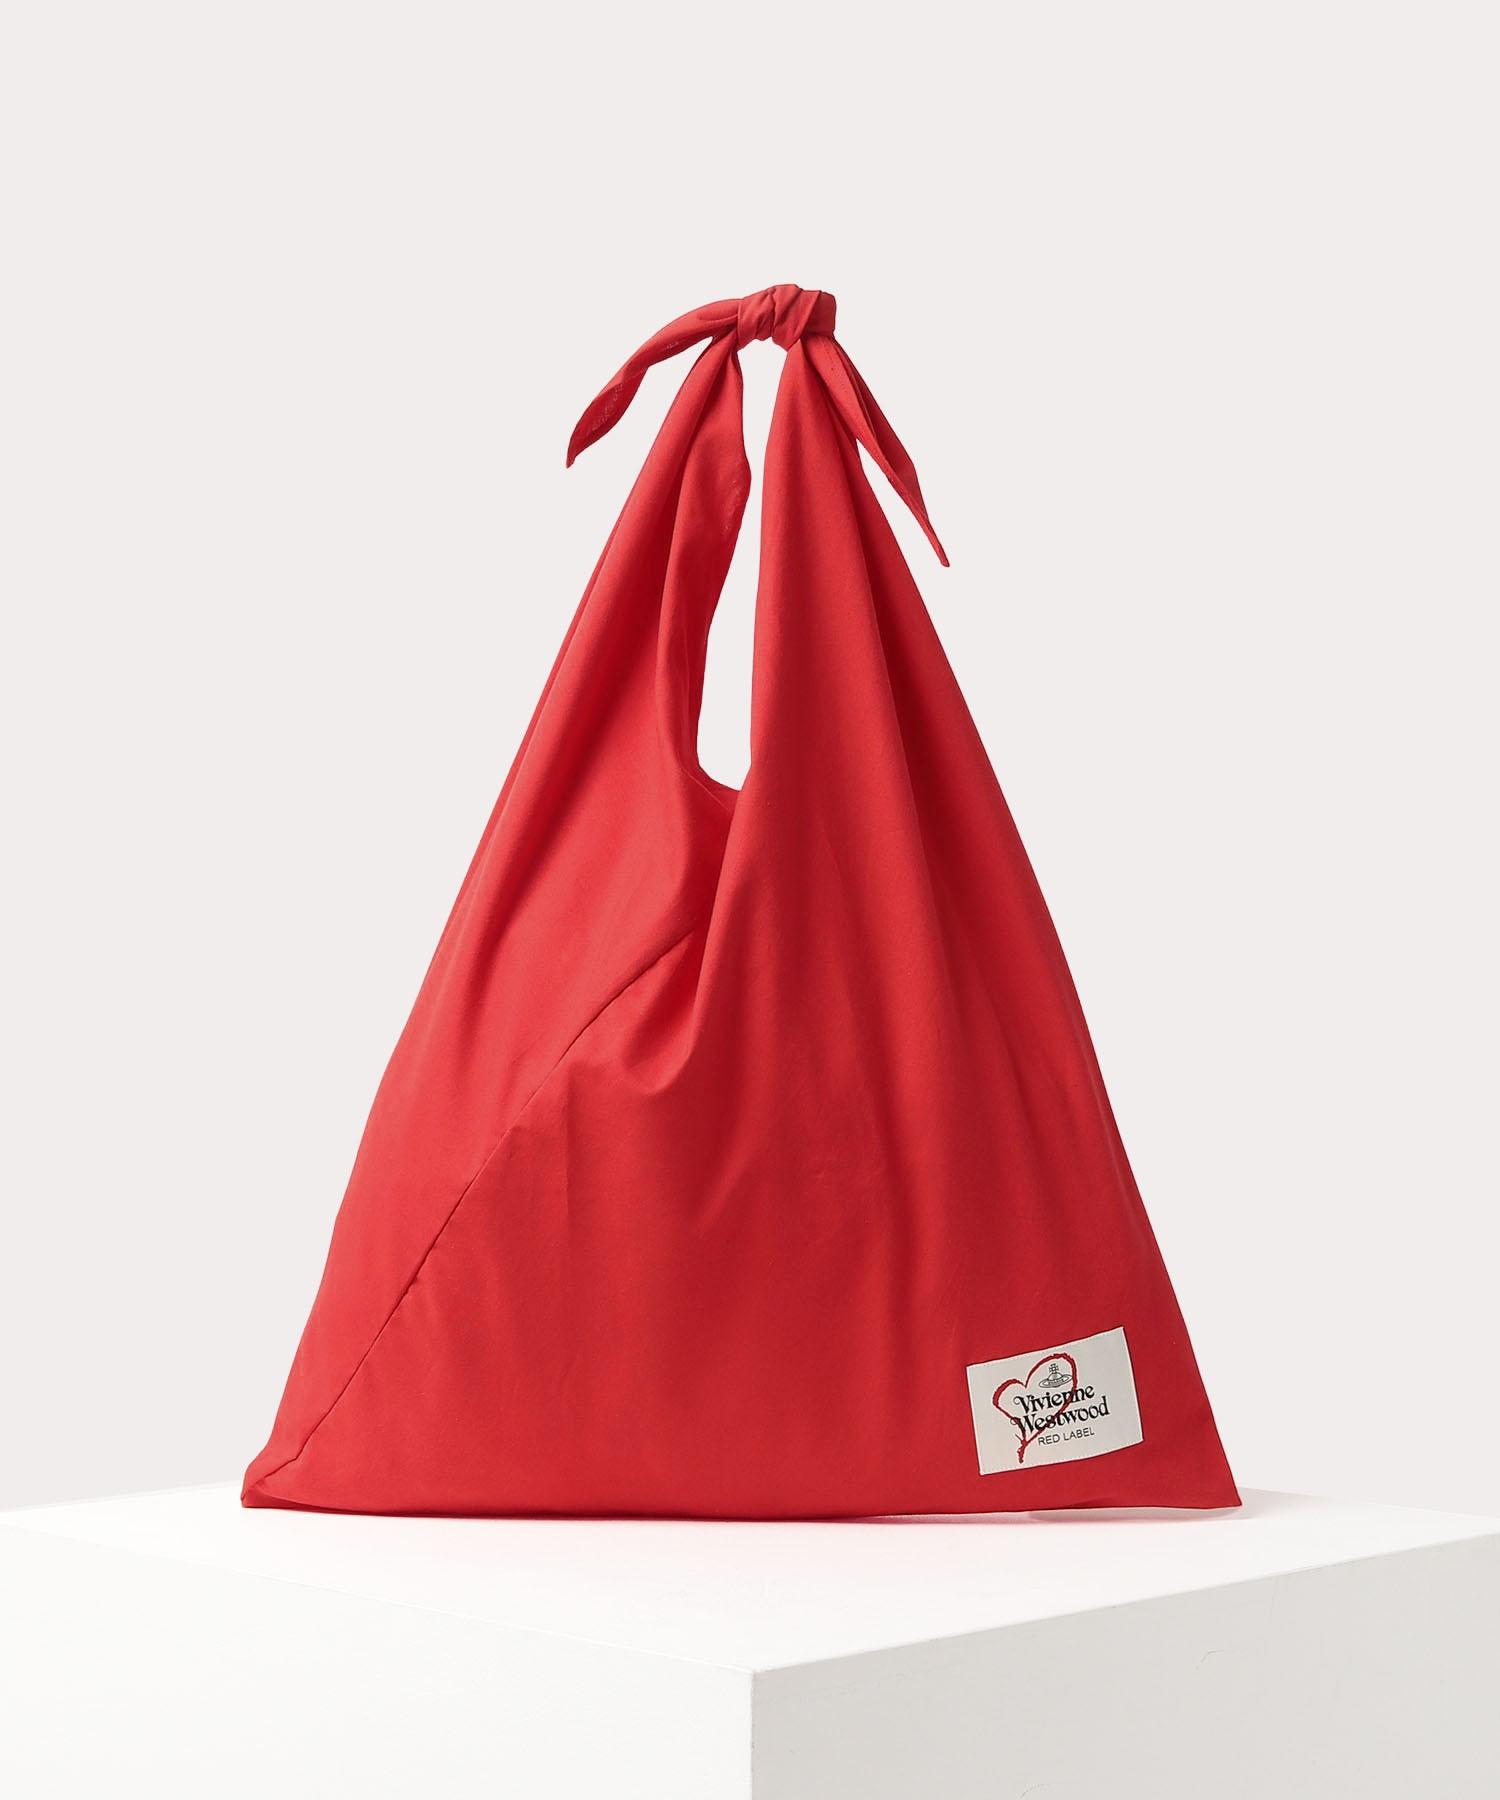 Vivienne Westwood RED LABEL×NANGA ドリフト パーカー